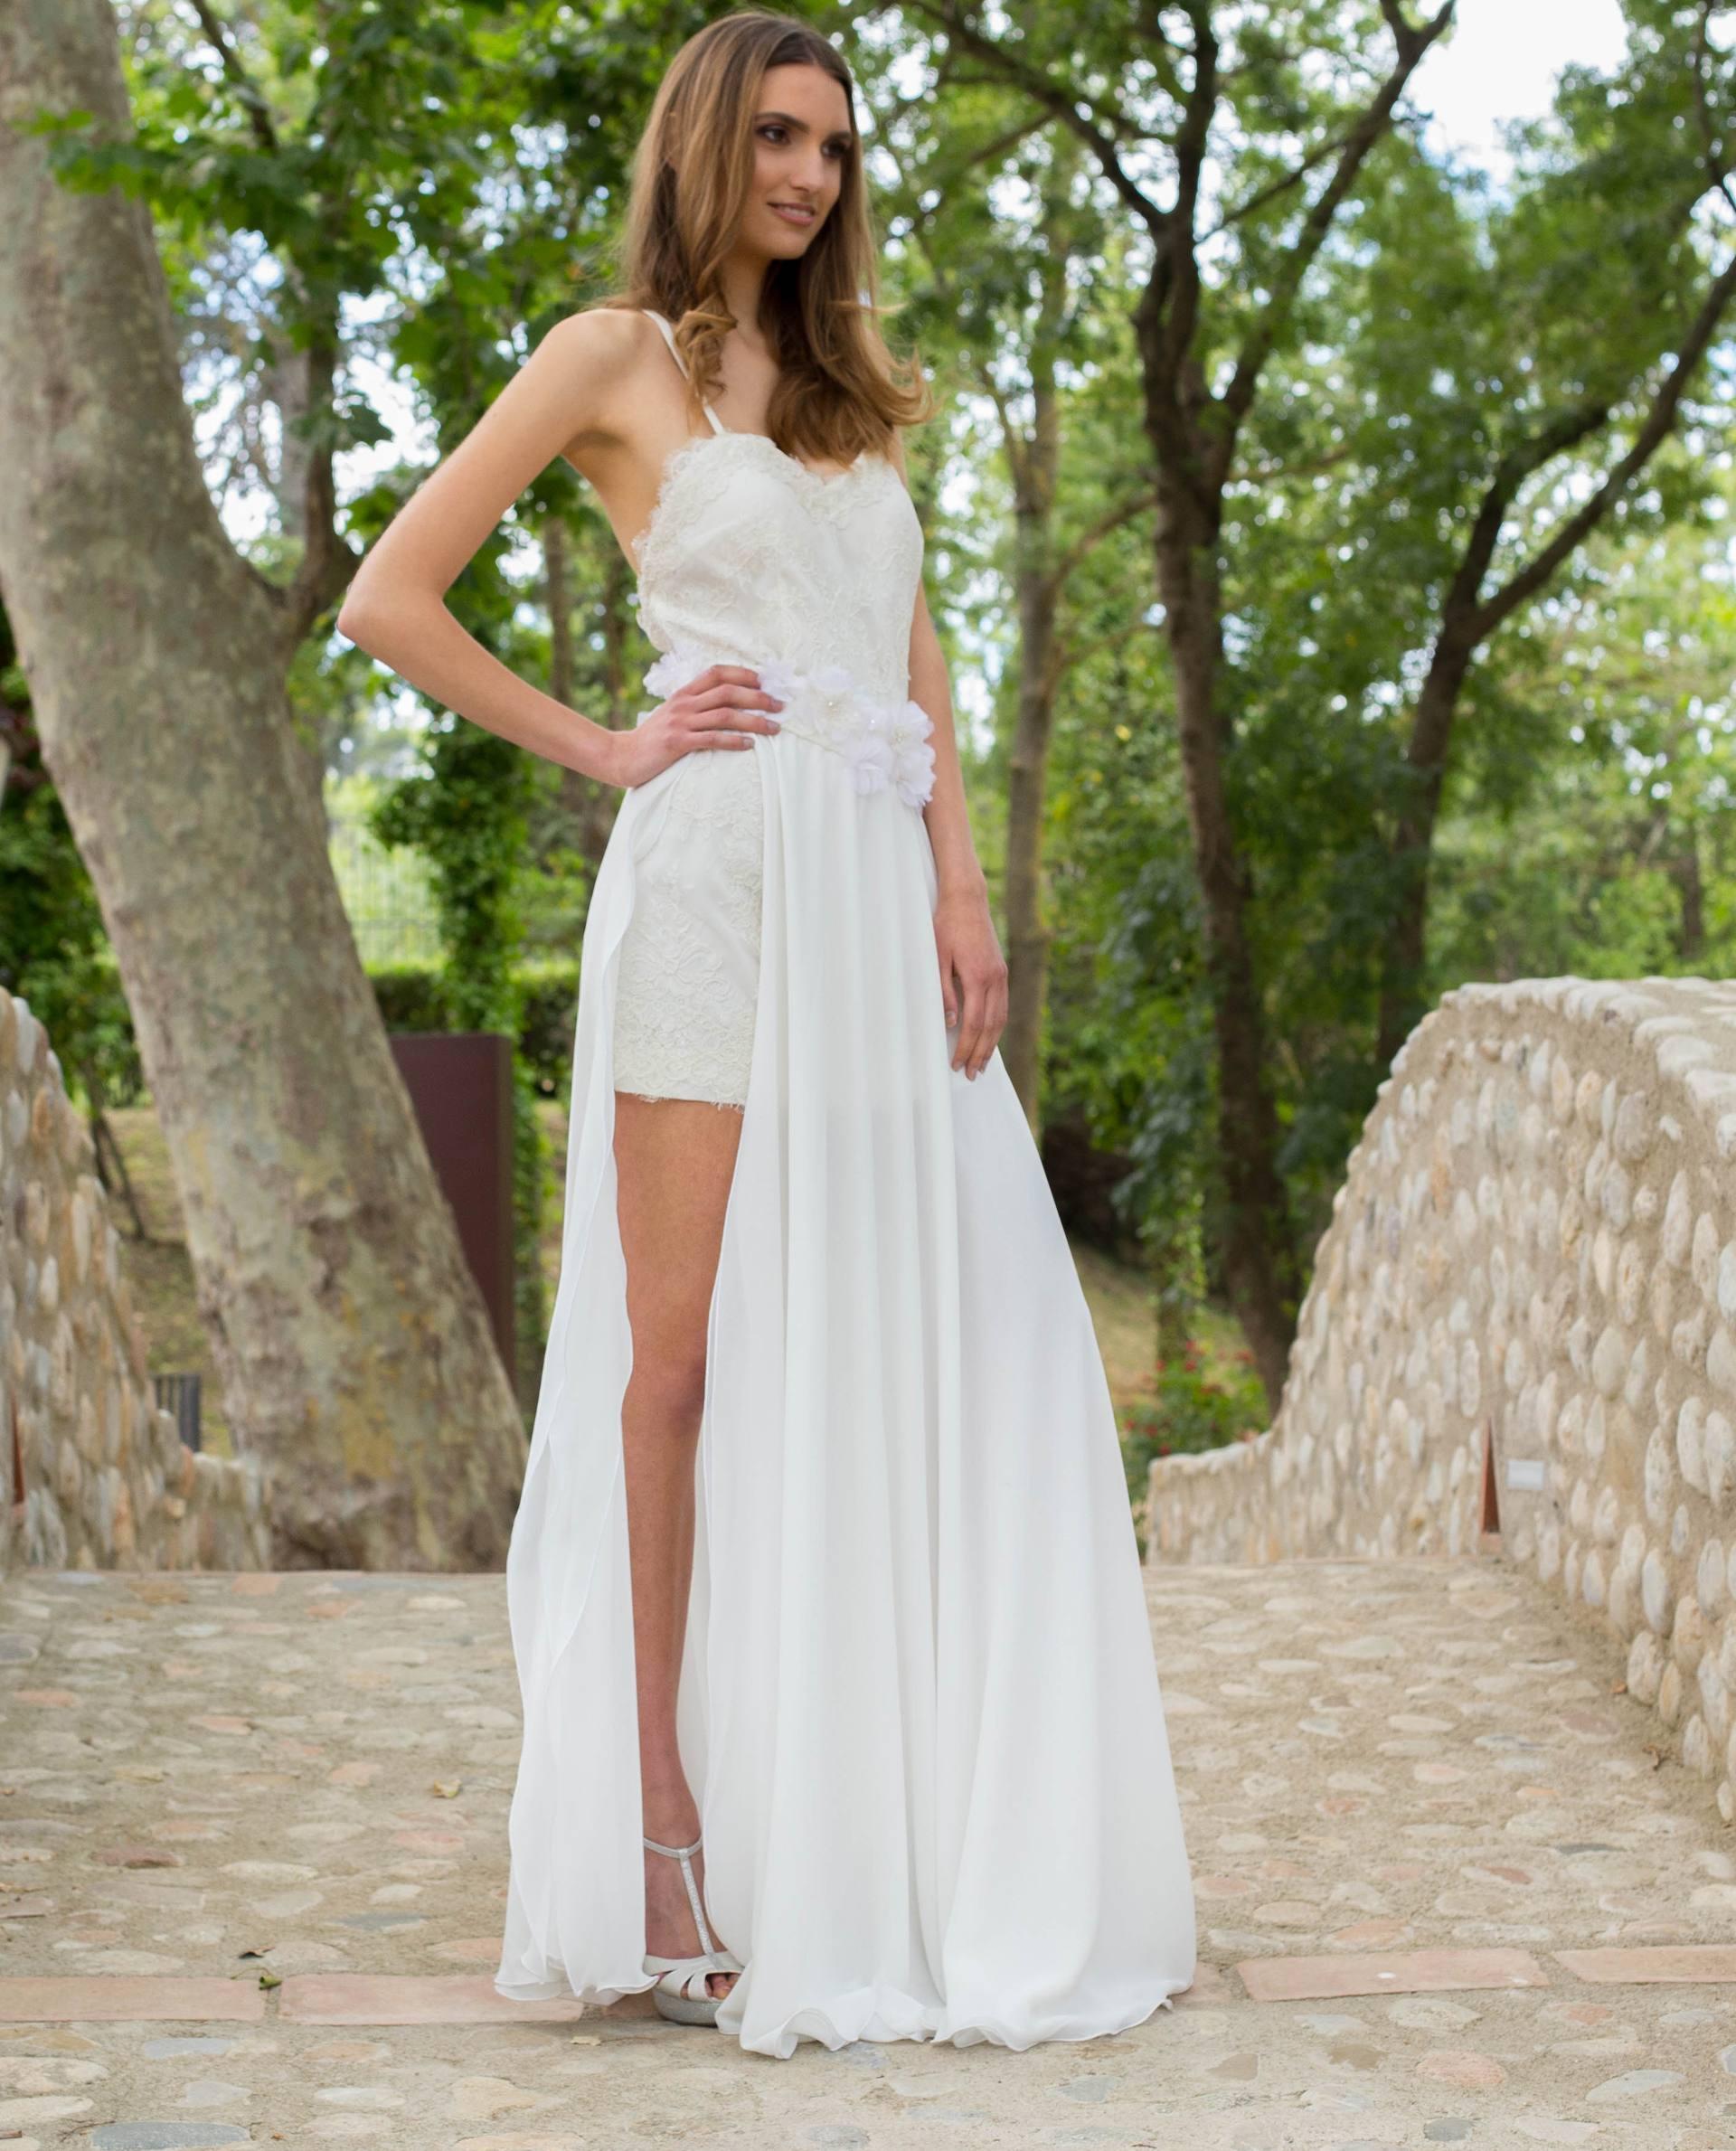 BRIDAL-NATURE 2017/18 - FALDAS - Falda novia Auril